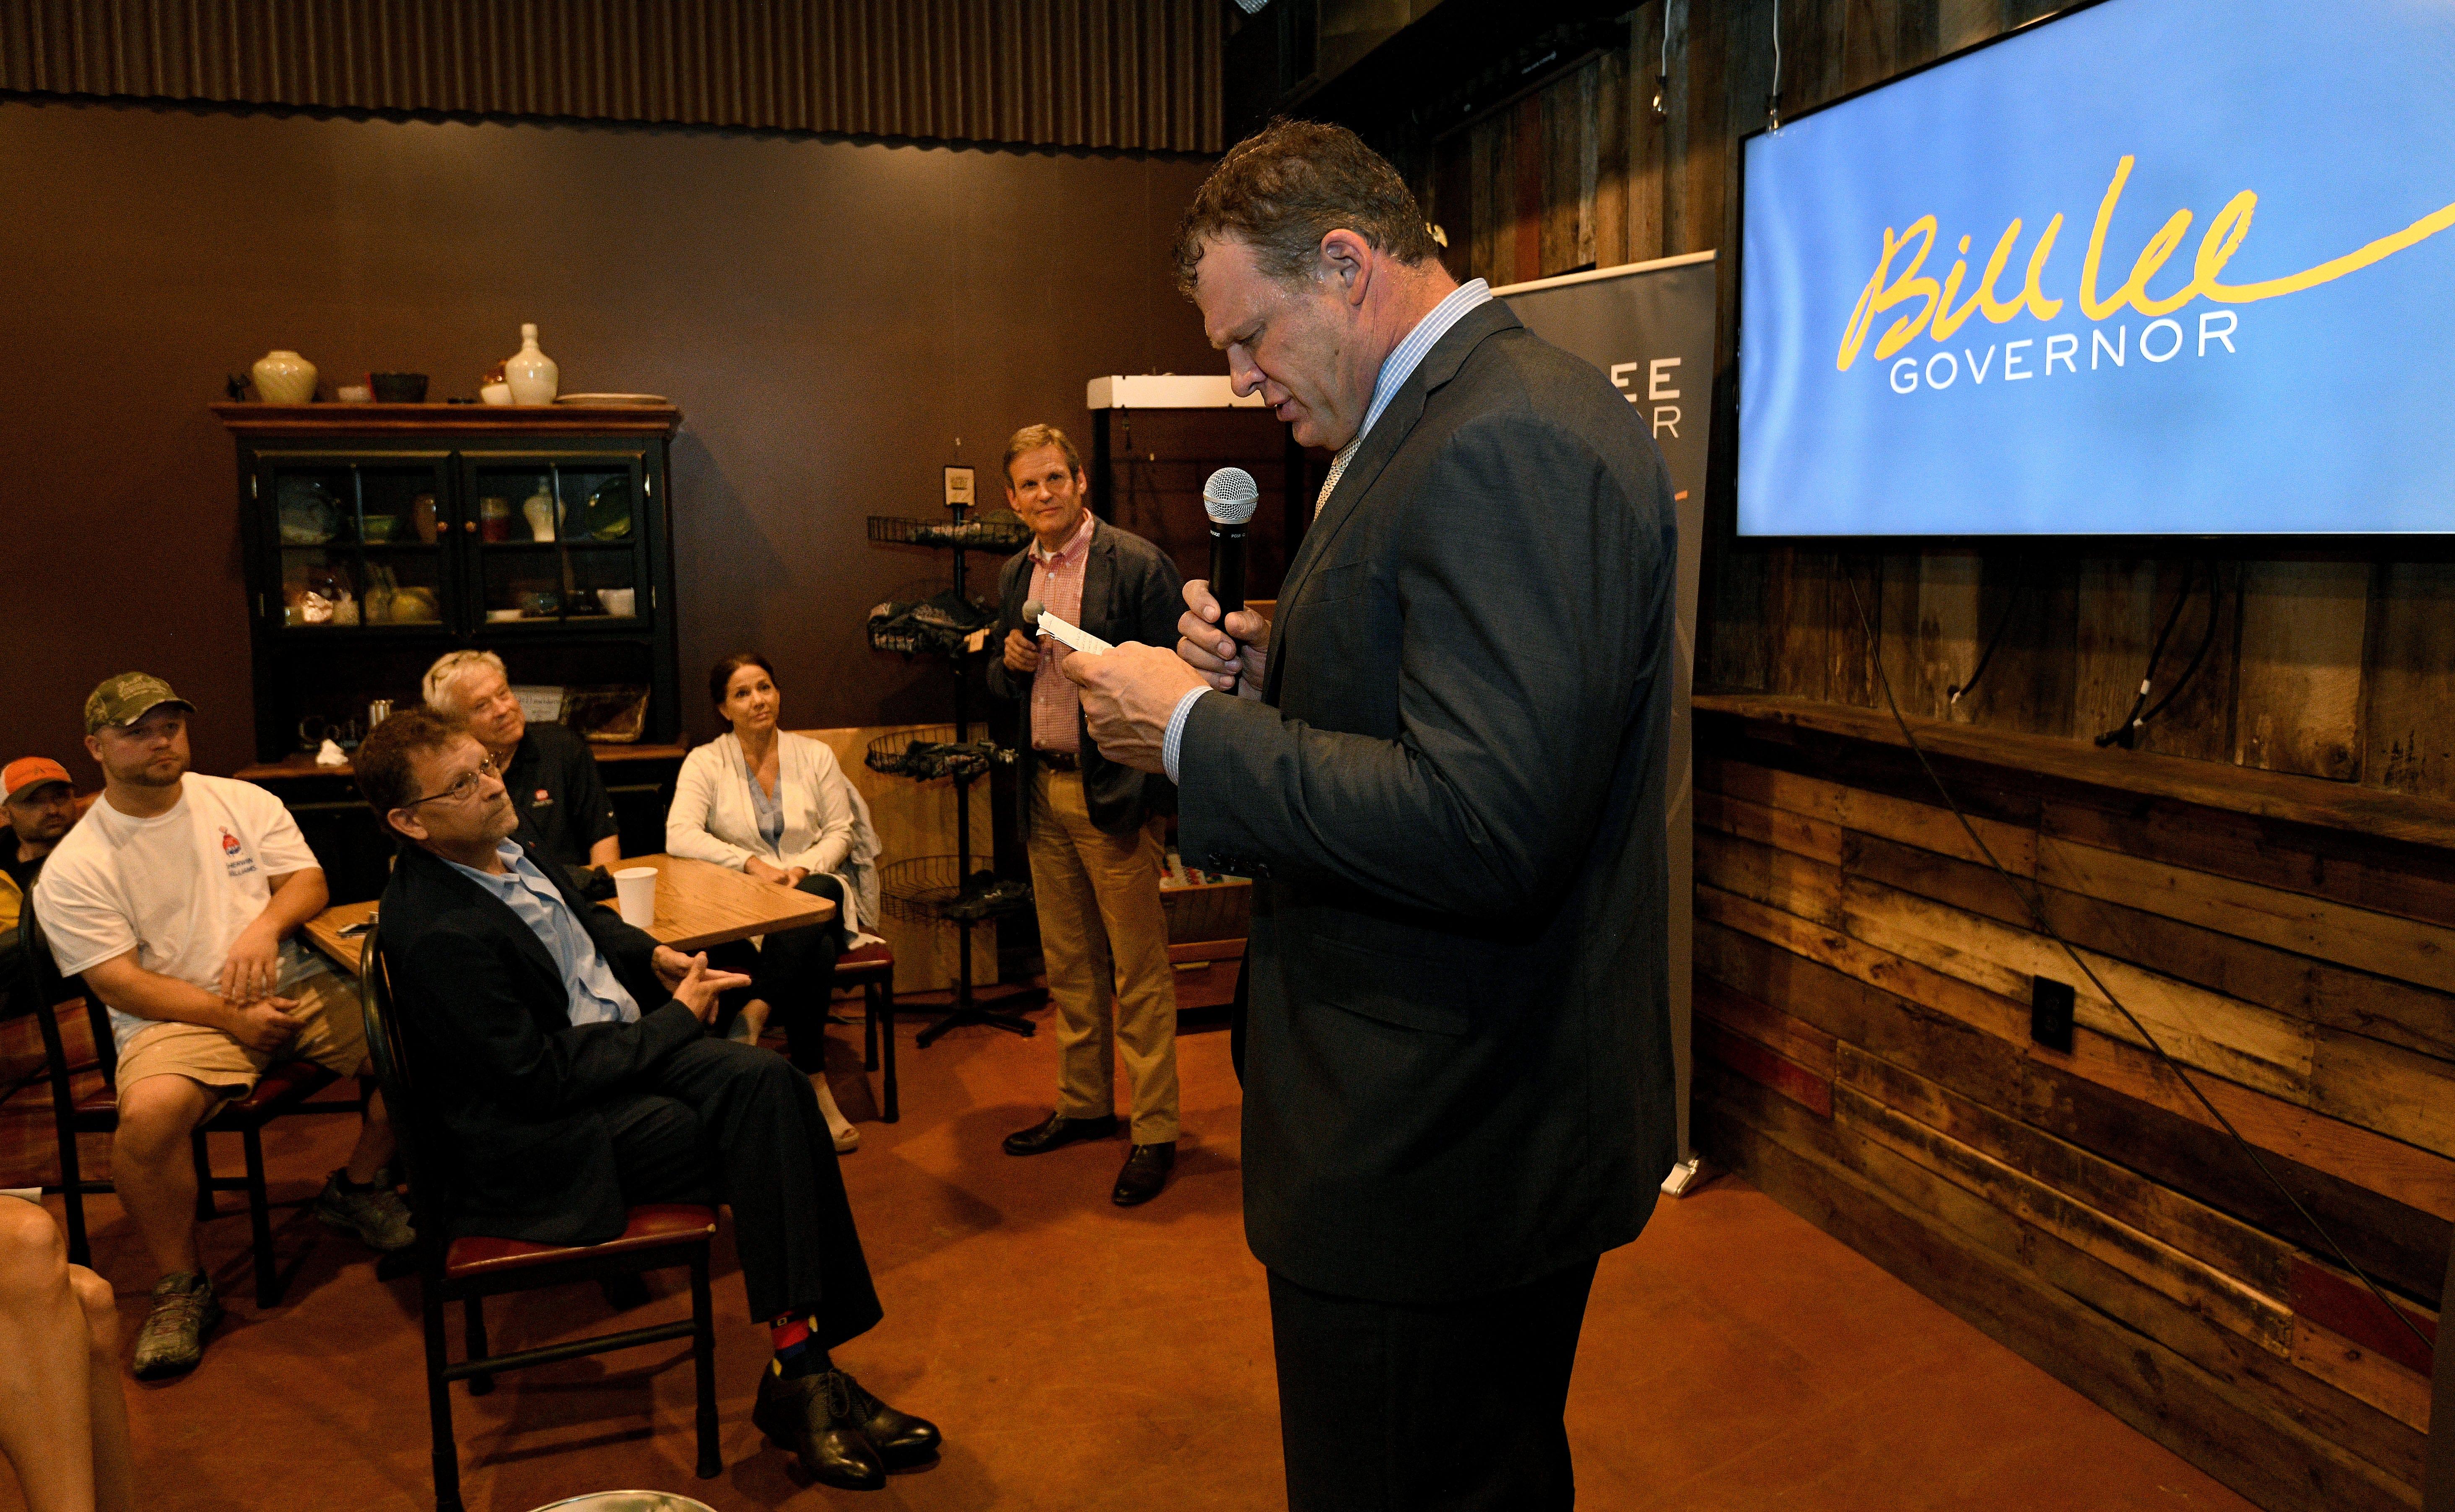 http://www.knoxnews.com/picture-gallery/news/politics/2018/06/28/bill ...